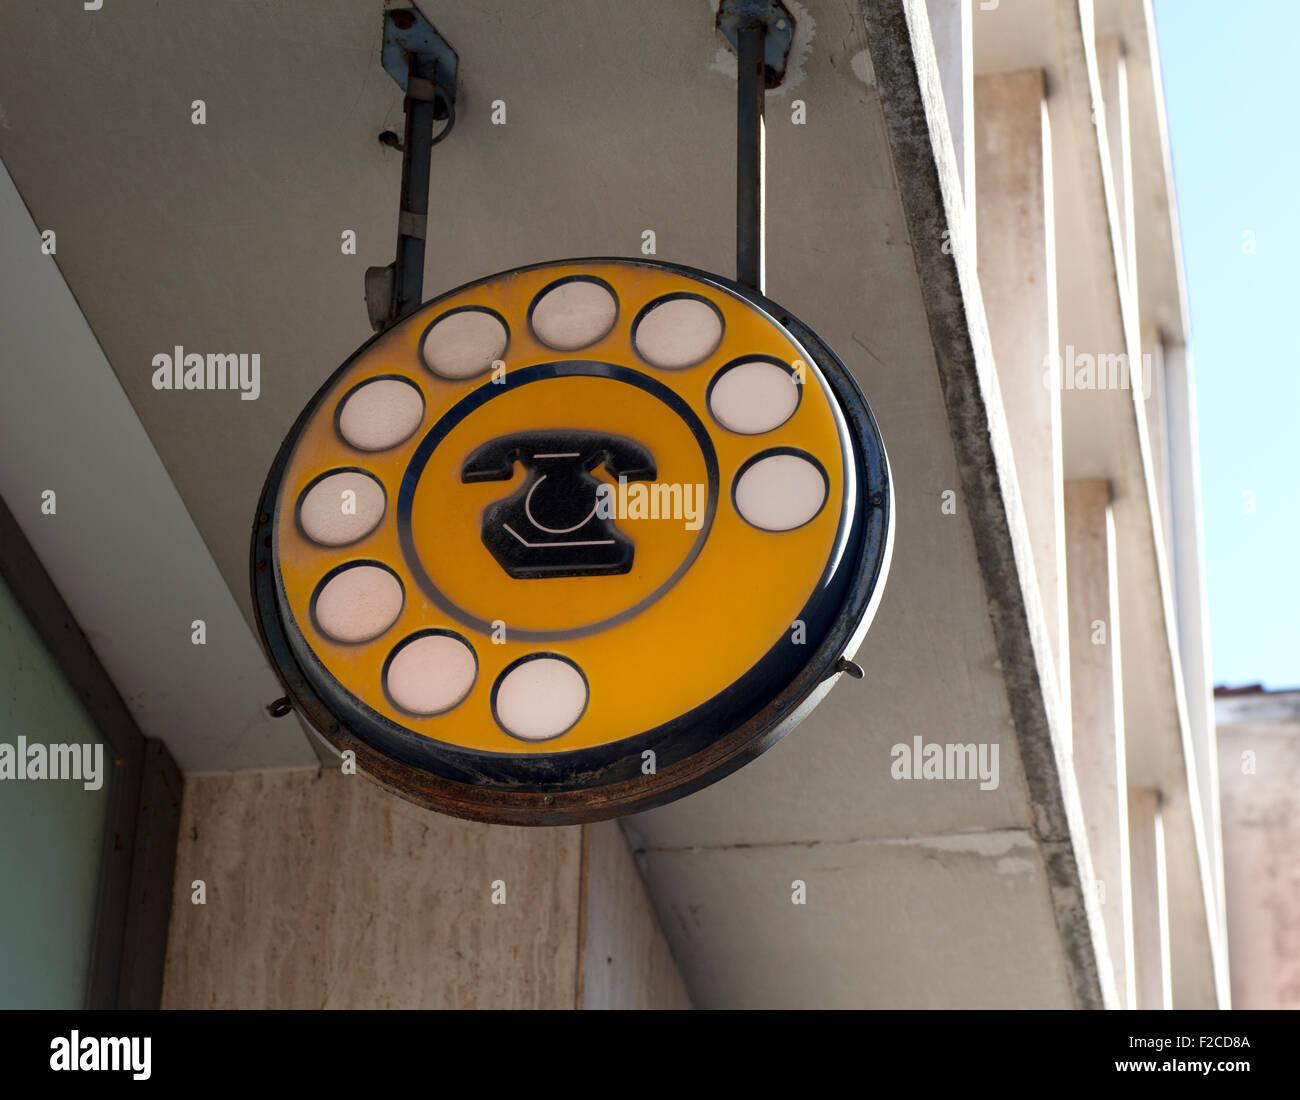 Old italian public telephon sign - Stock Image